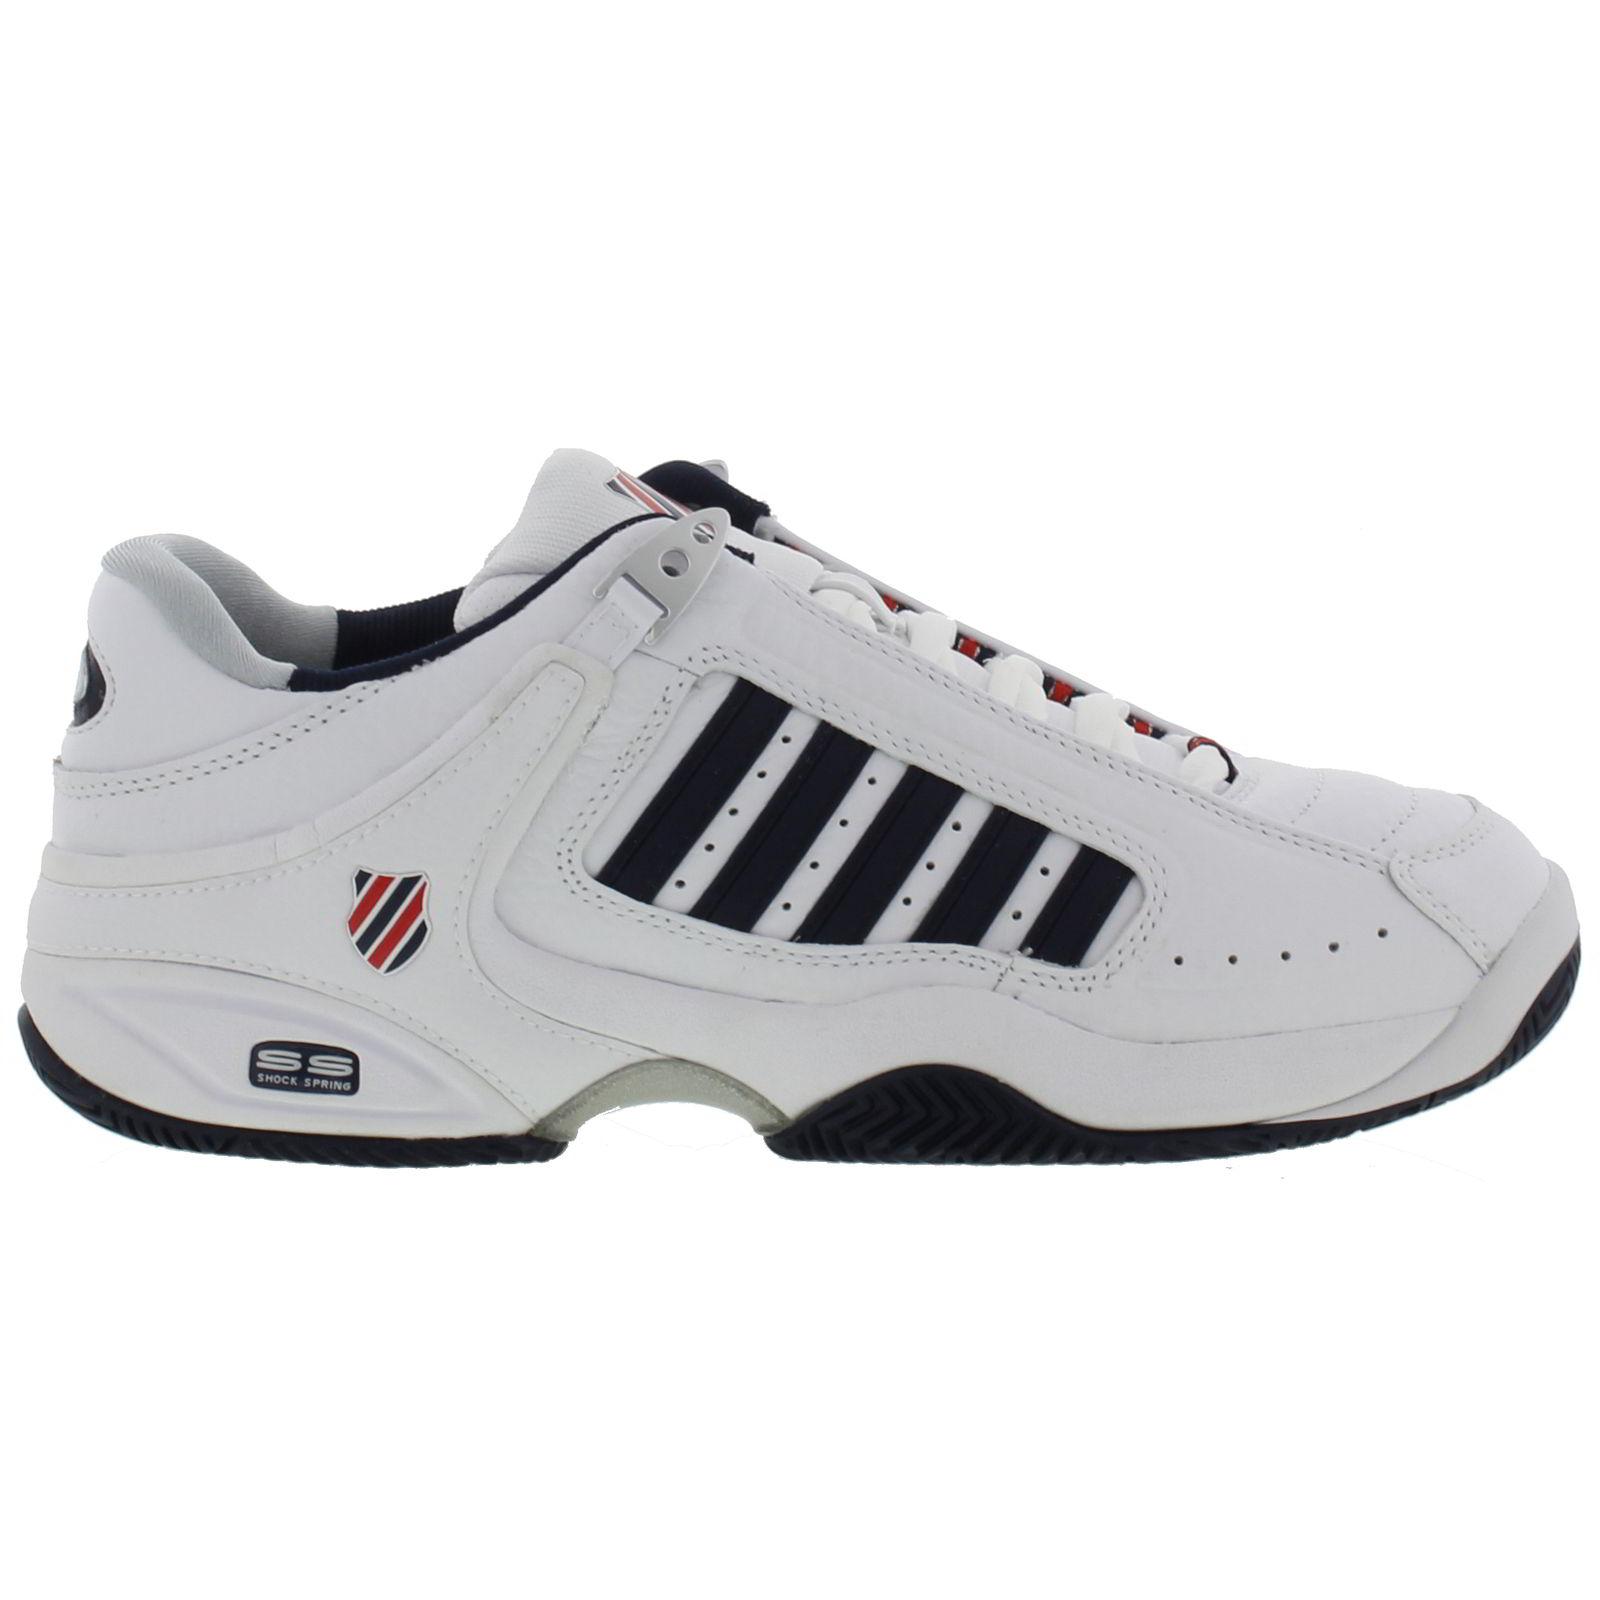 K Swiss Defier Rs Outdoor Mens Tennis Shoes